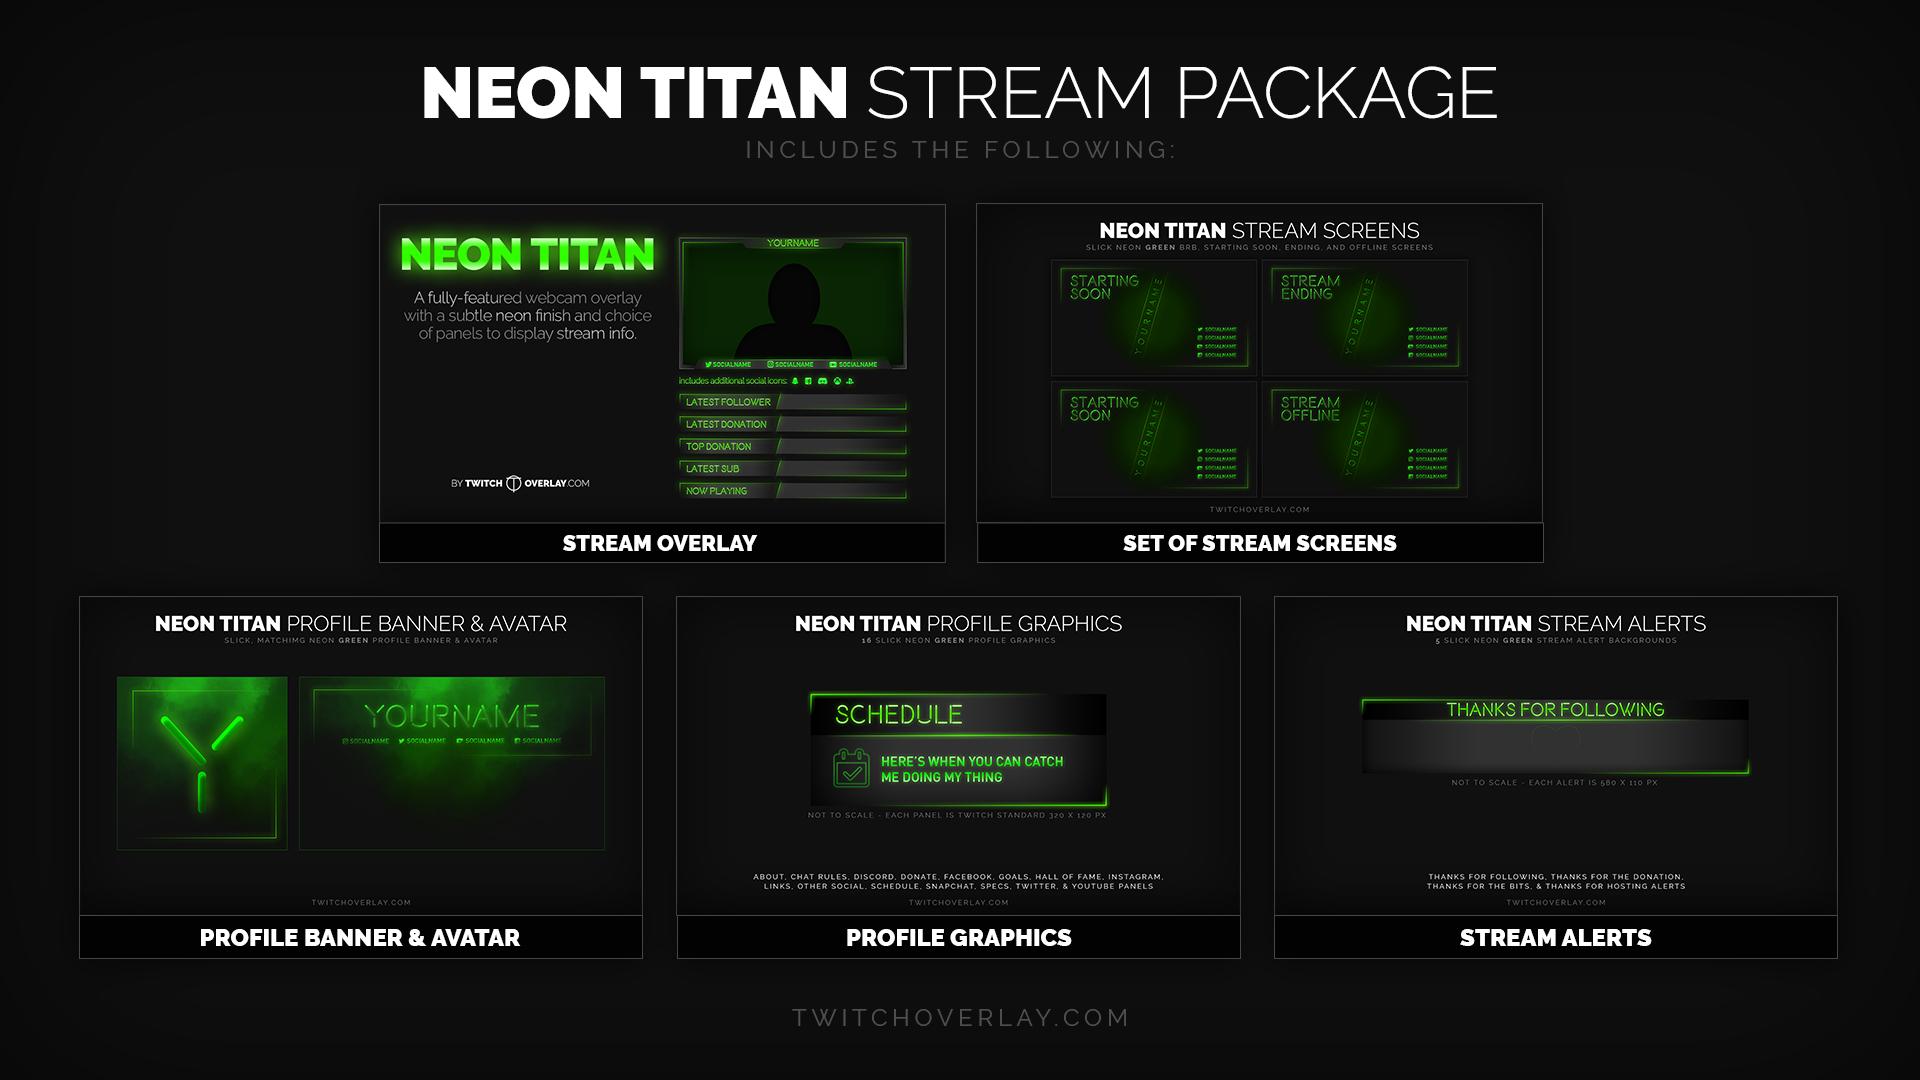 neon titan stream packaged added twitch overlay